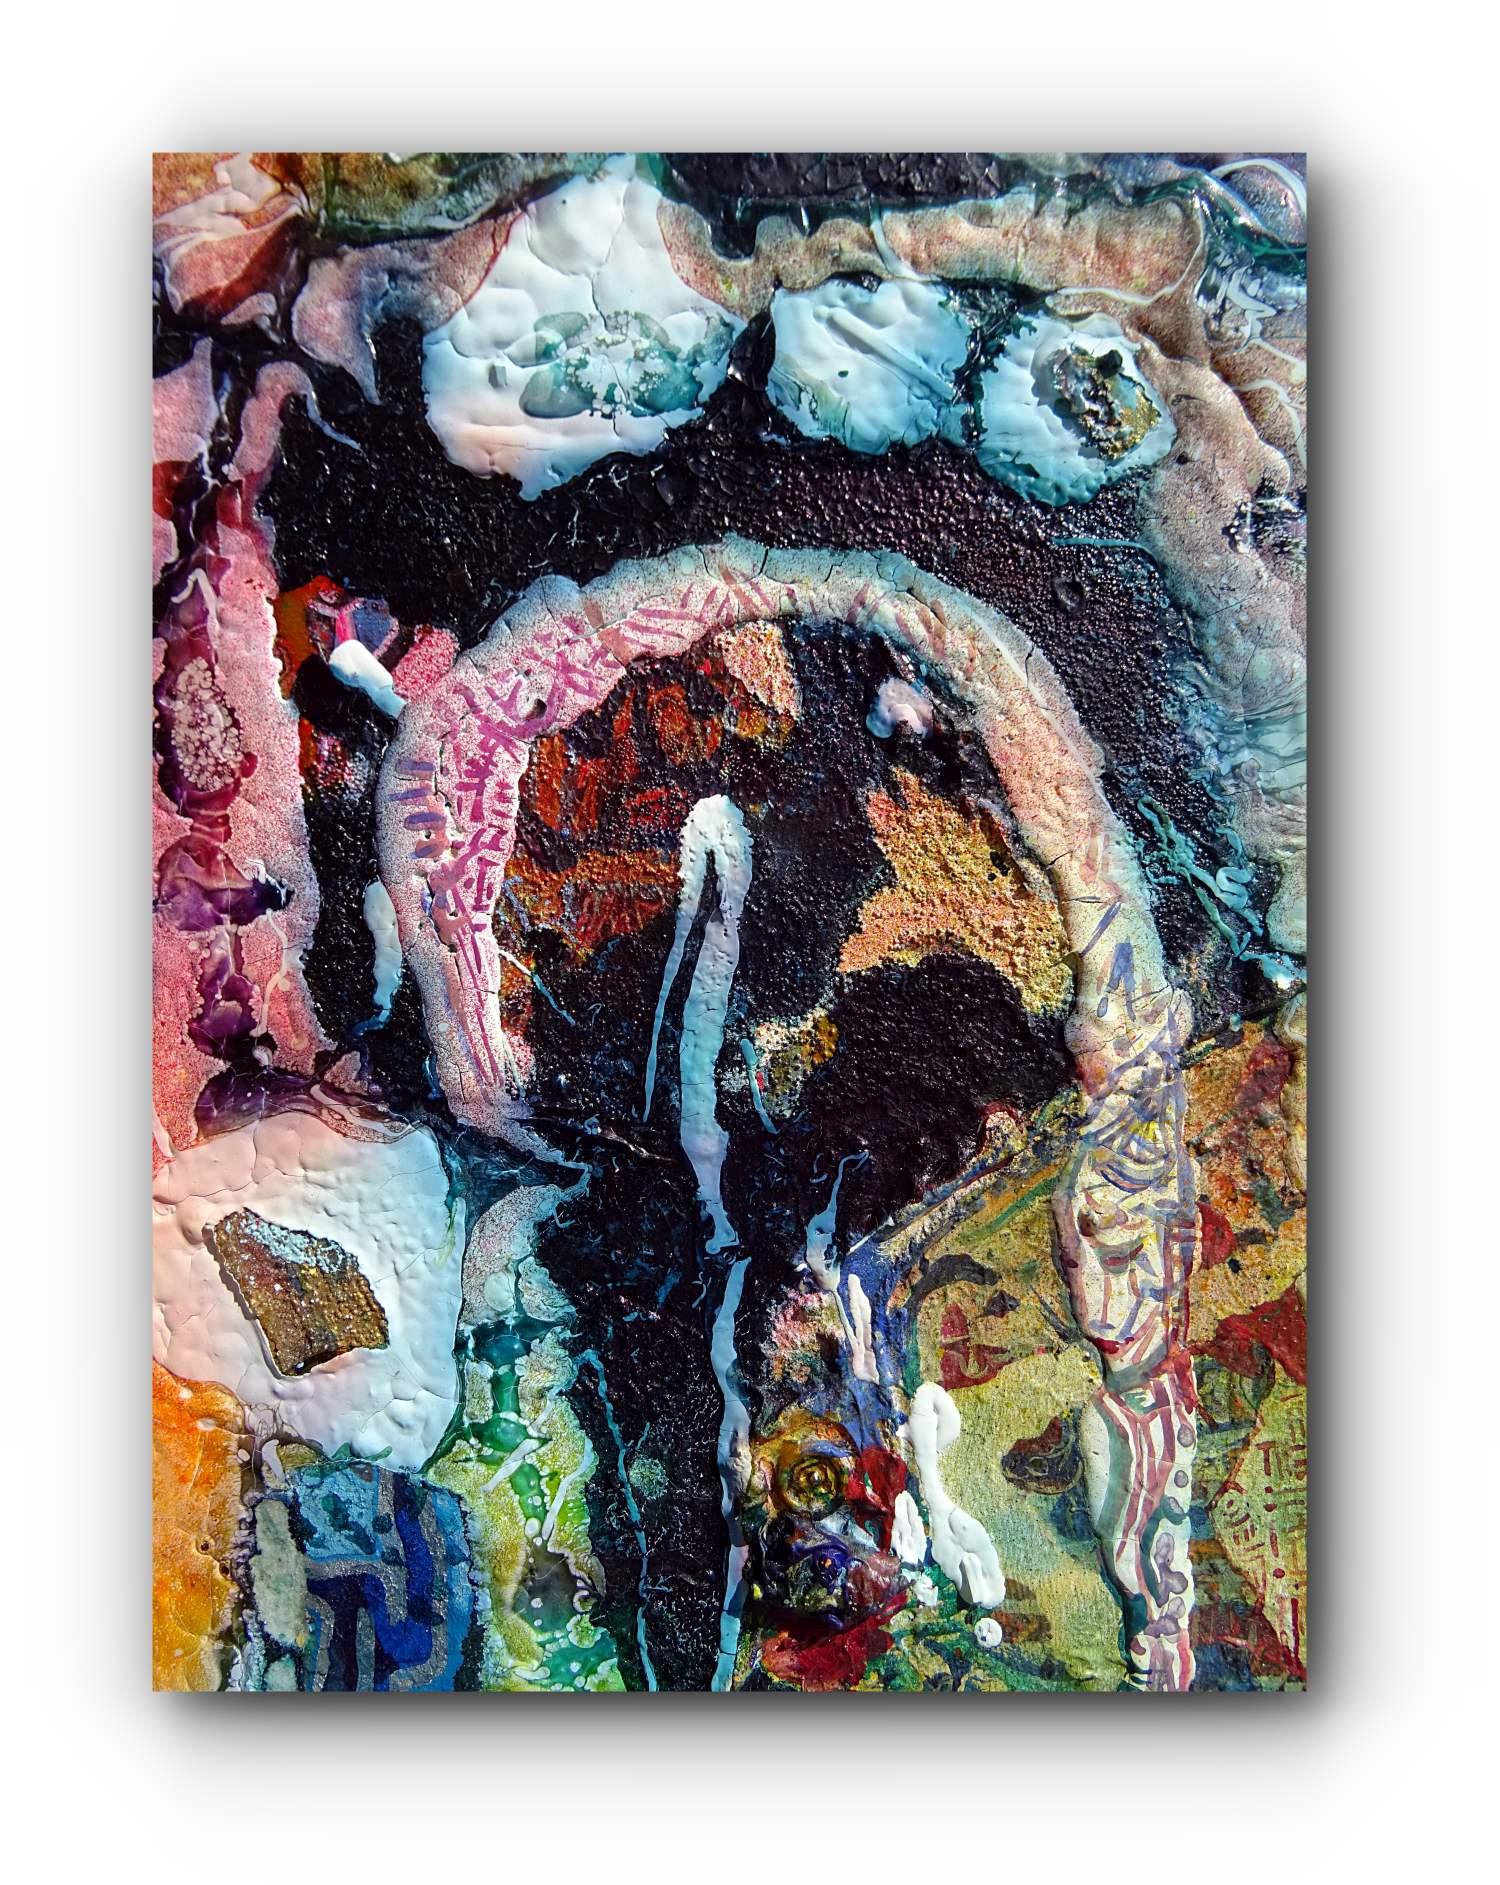 painting-detail-5-kiss-artist-duo-ingress-vortices.jpg